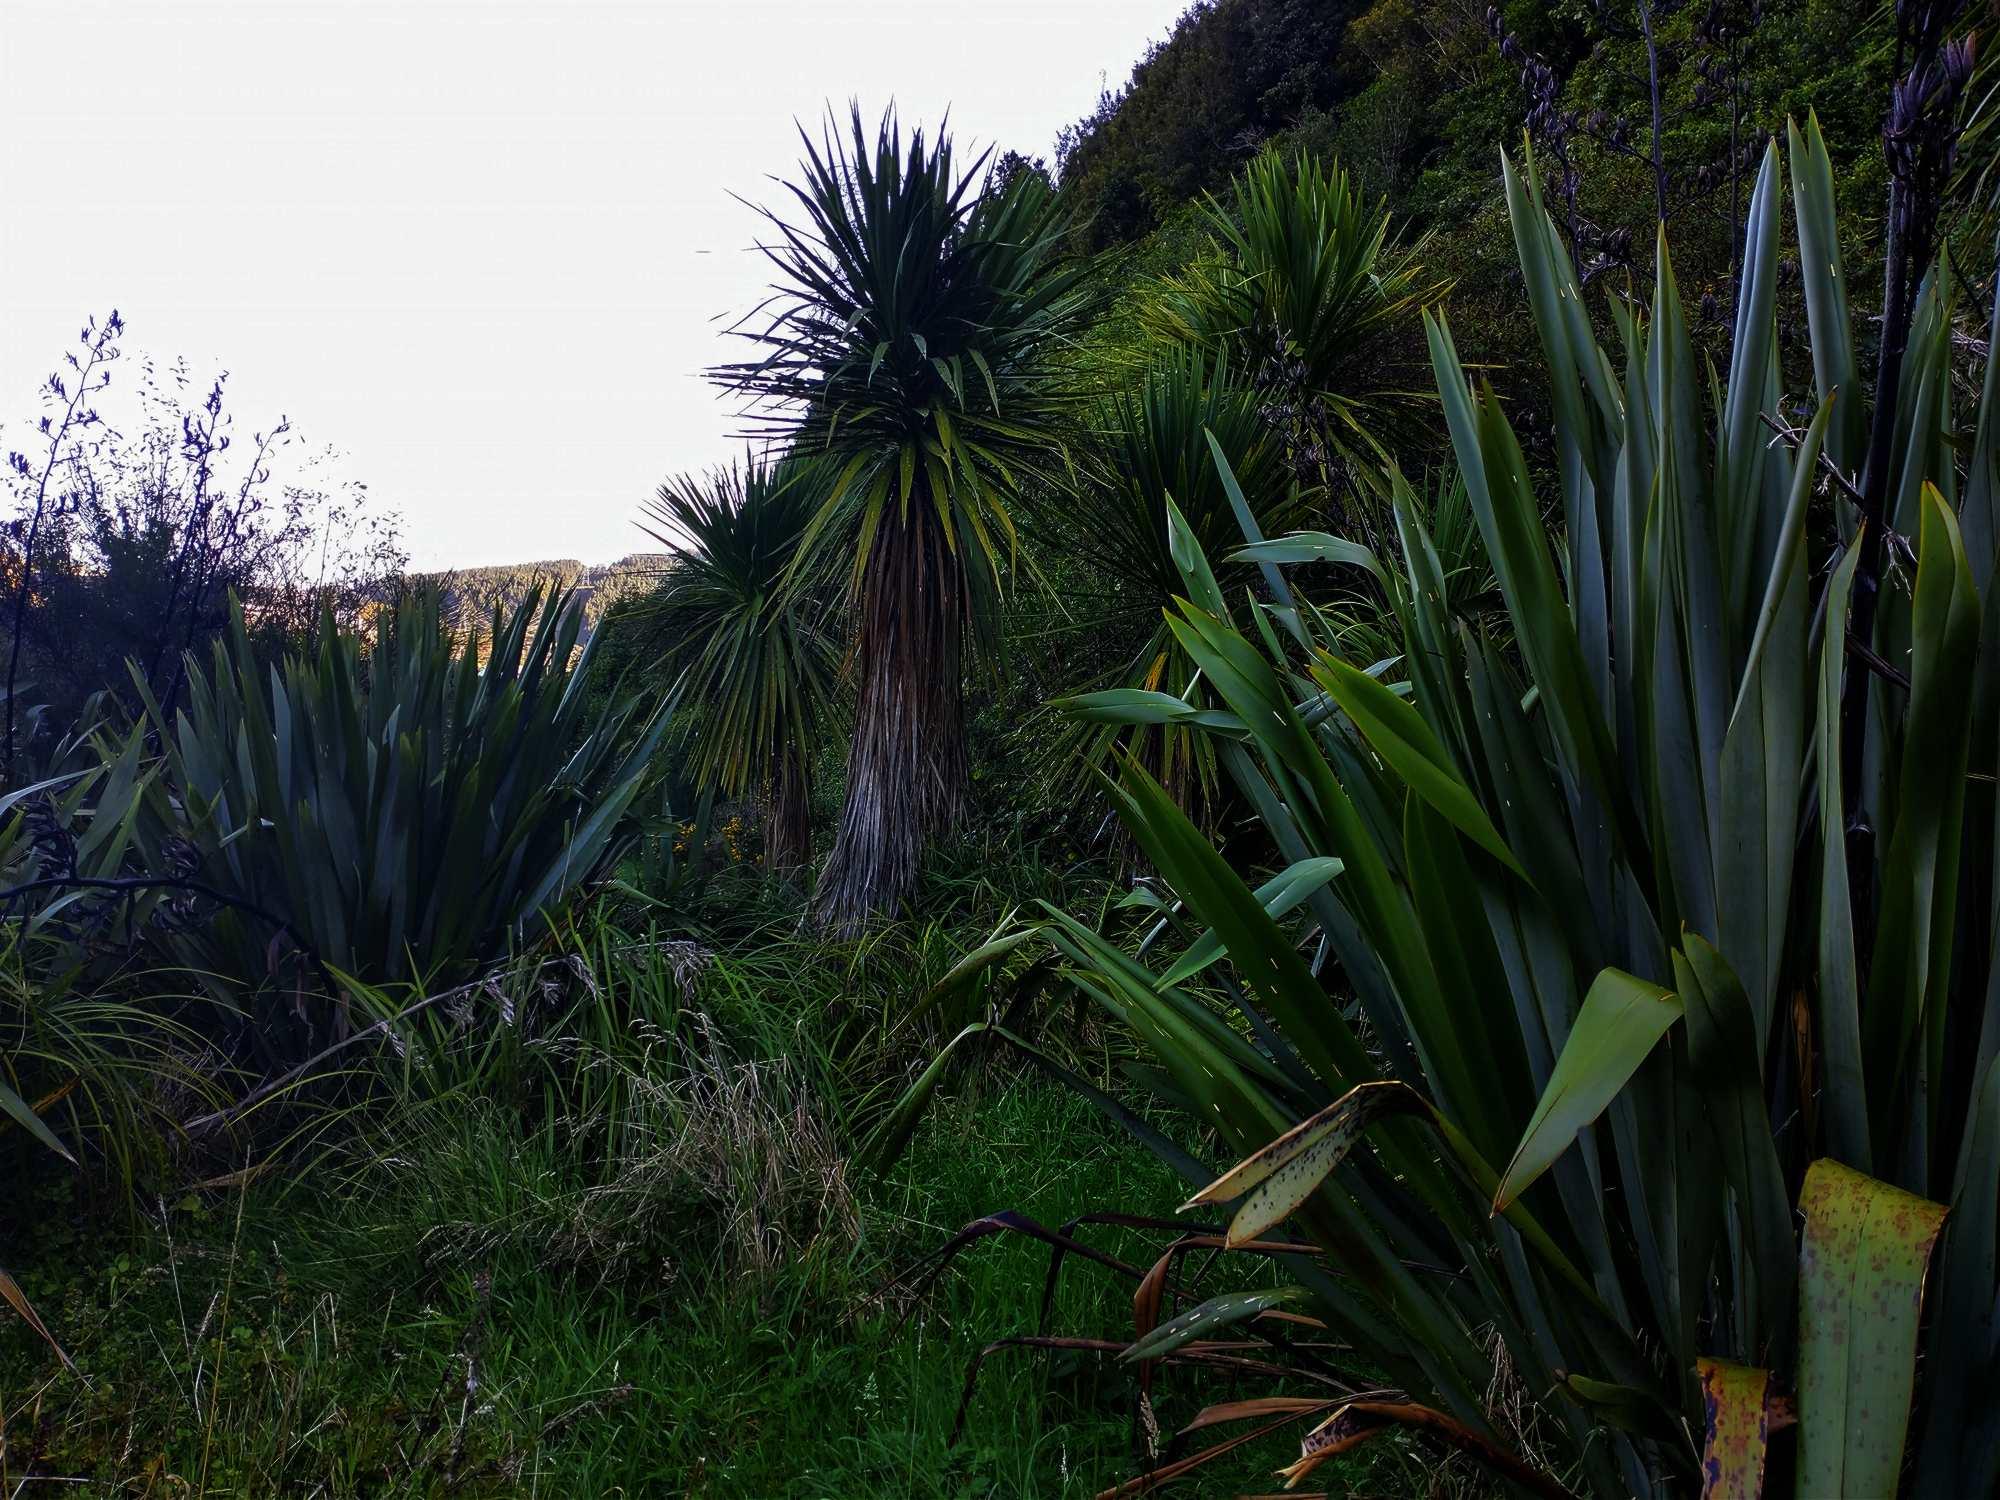 Woodburn Reserve Cabbage Trees and flax April 2021 | Friends of Tawa Bush